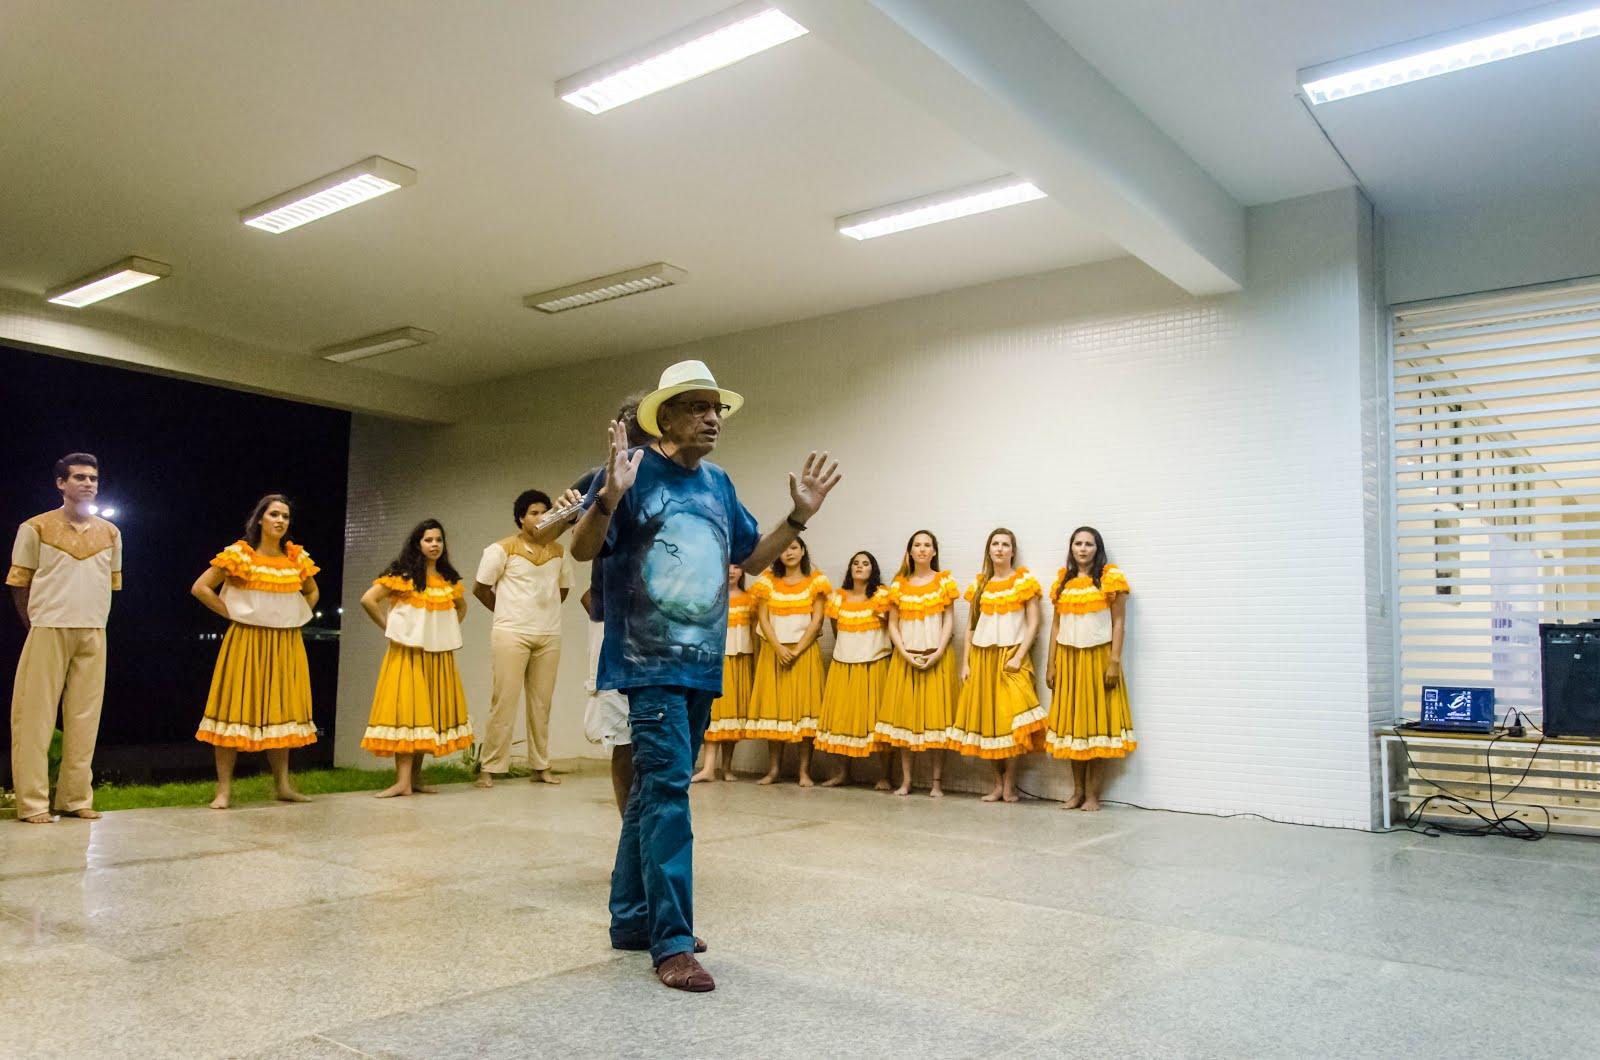 RECITAL NO SIMPÓSIO FRANCO-BRASILEIRO NA UFRN